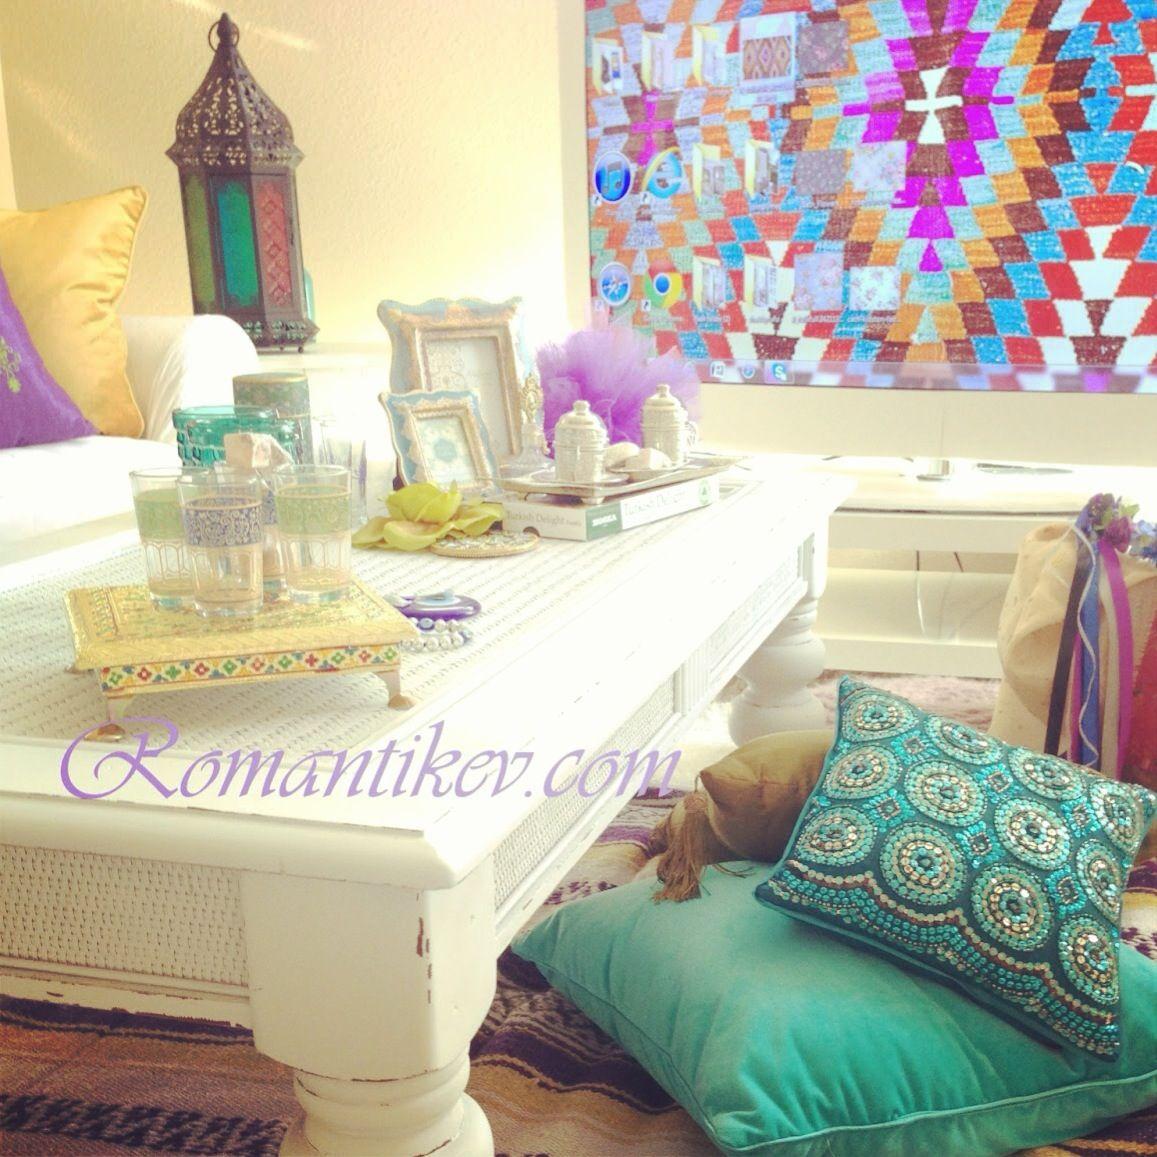 Bohemian decor Bohemian shabby chic style Boho ethnic style Turkish ethnic accessories Ottoman ethnic style Mix style